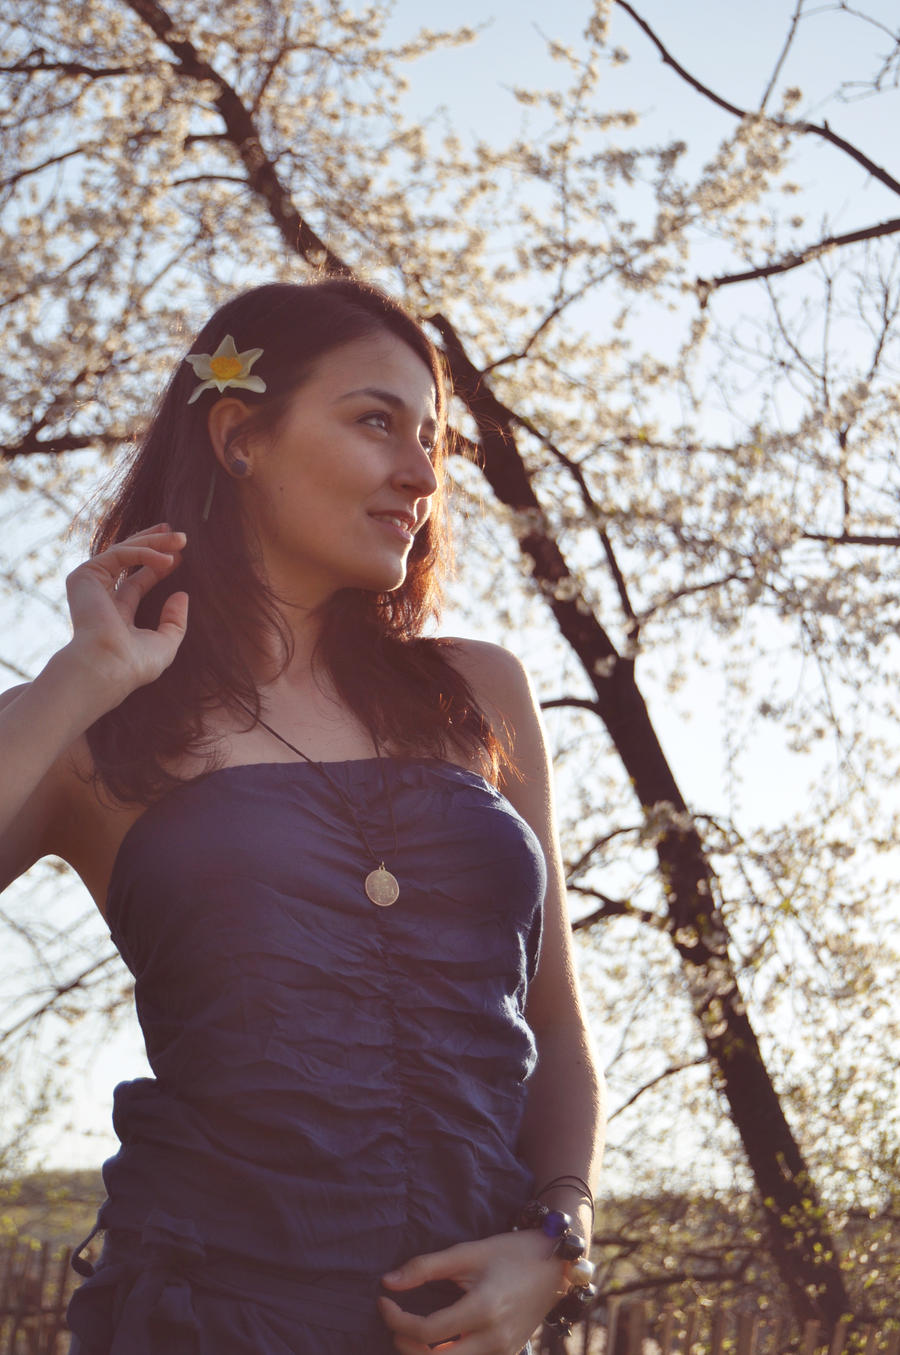 life looks better in spring by Alexaaandra